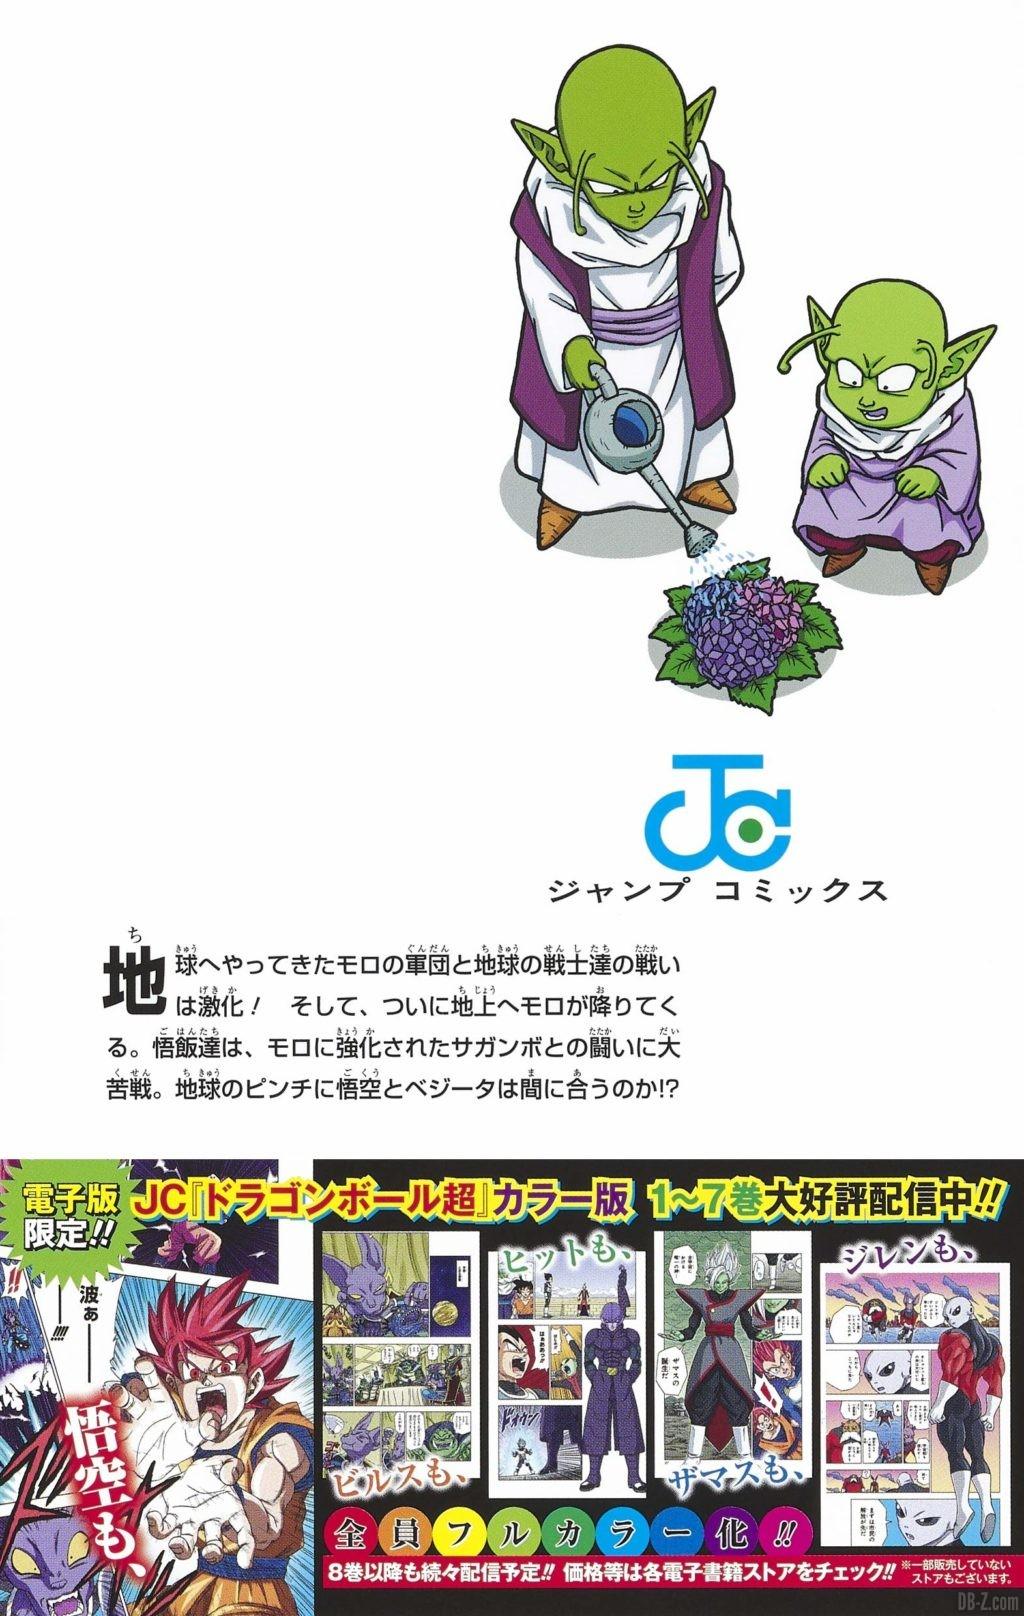 Cover arrière tome 13 Dragon Ball Super avec promo